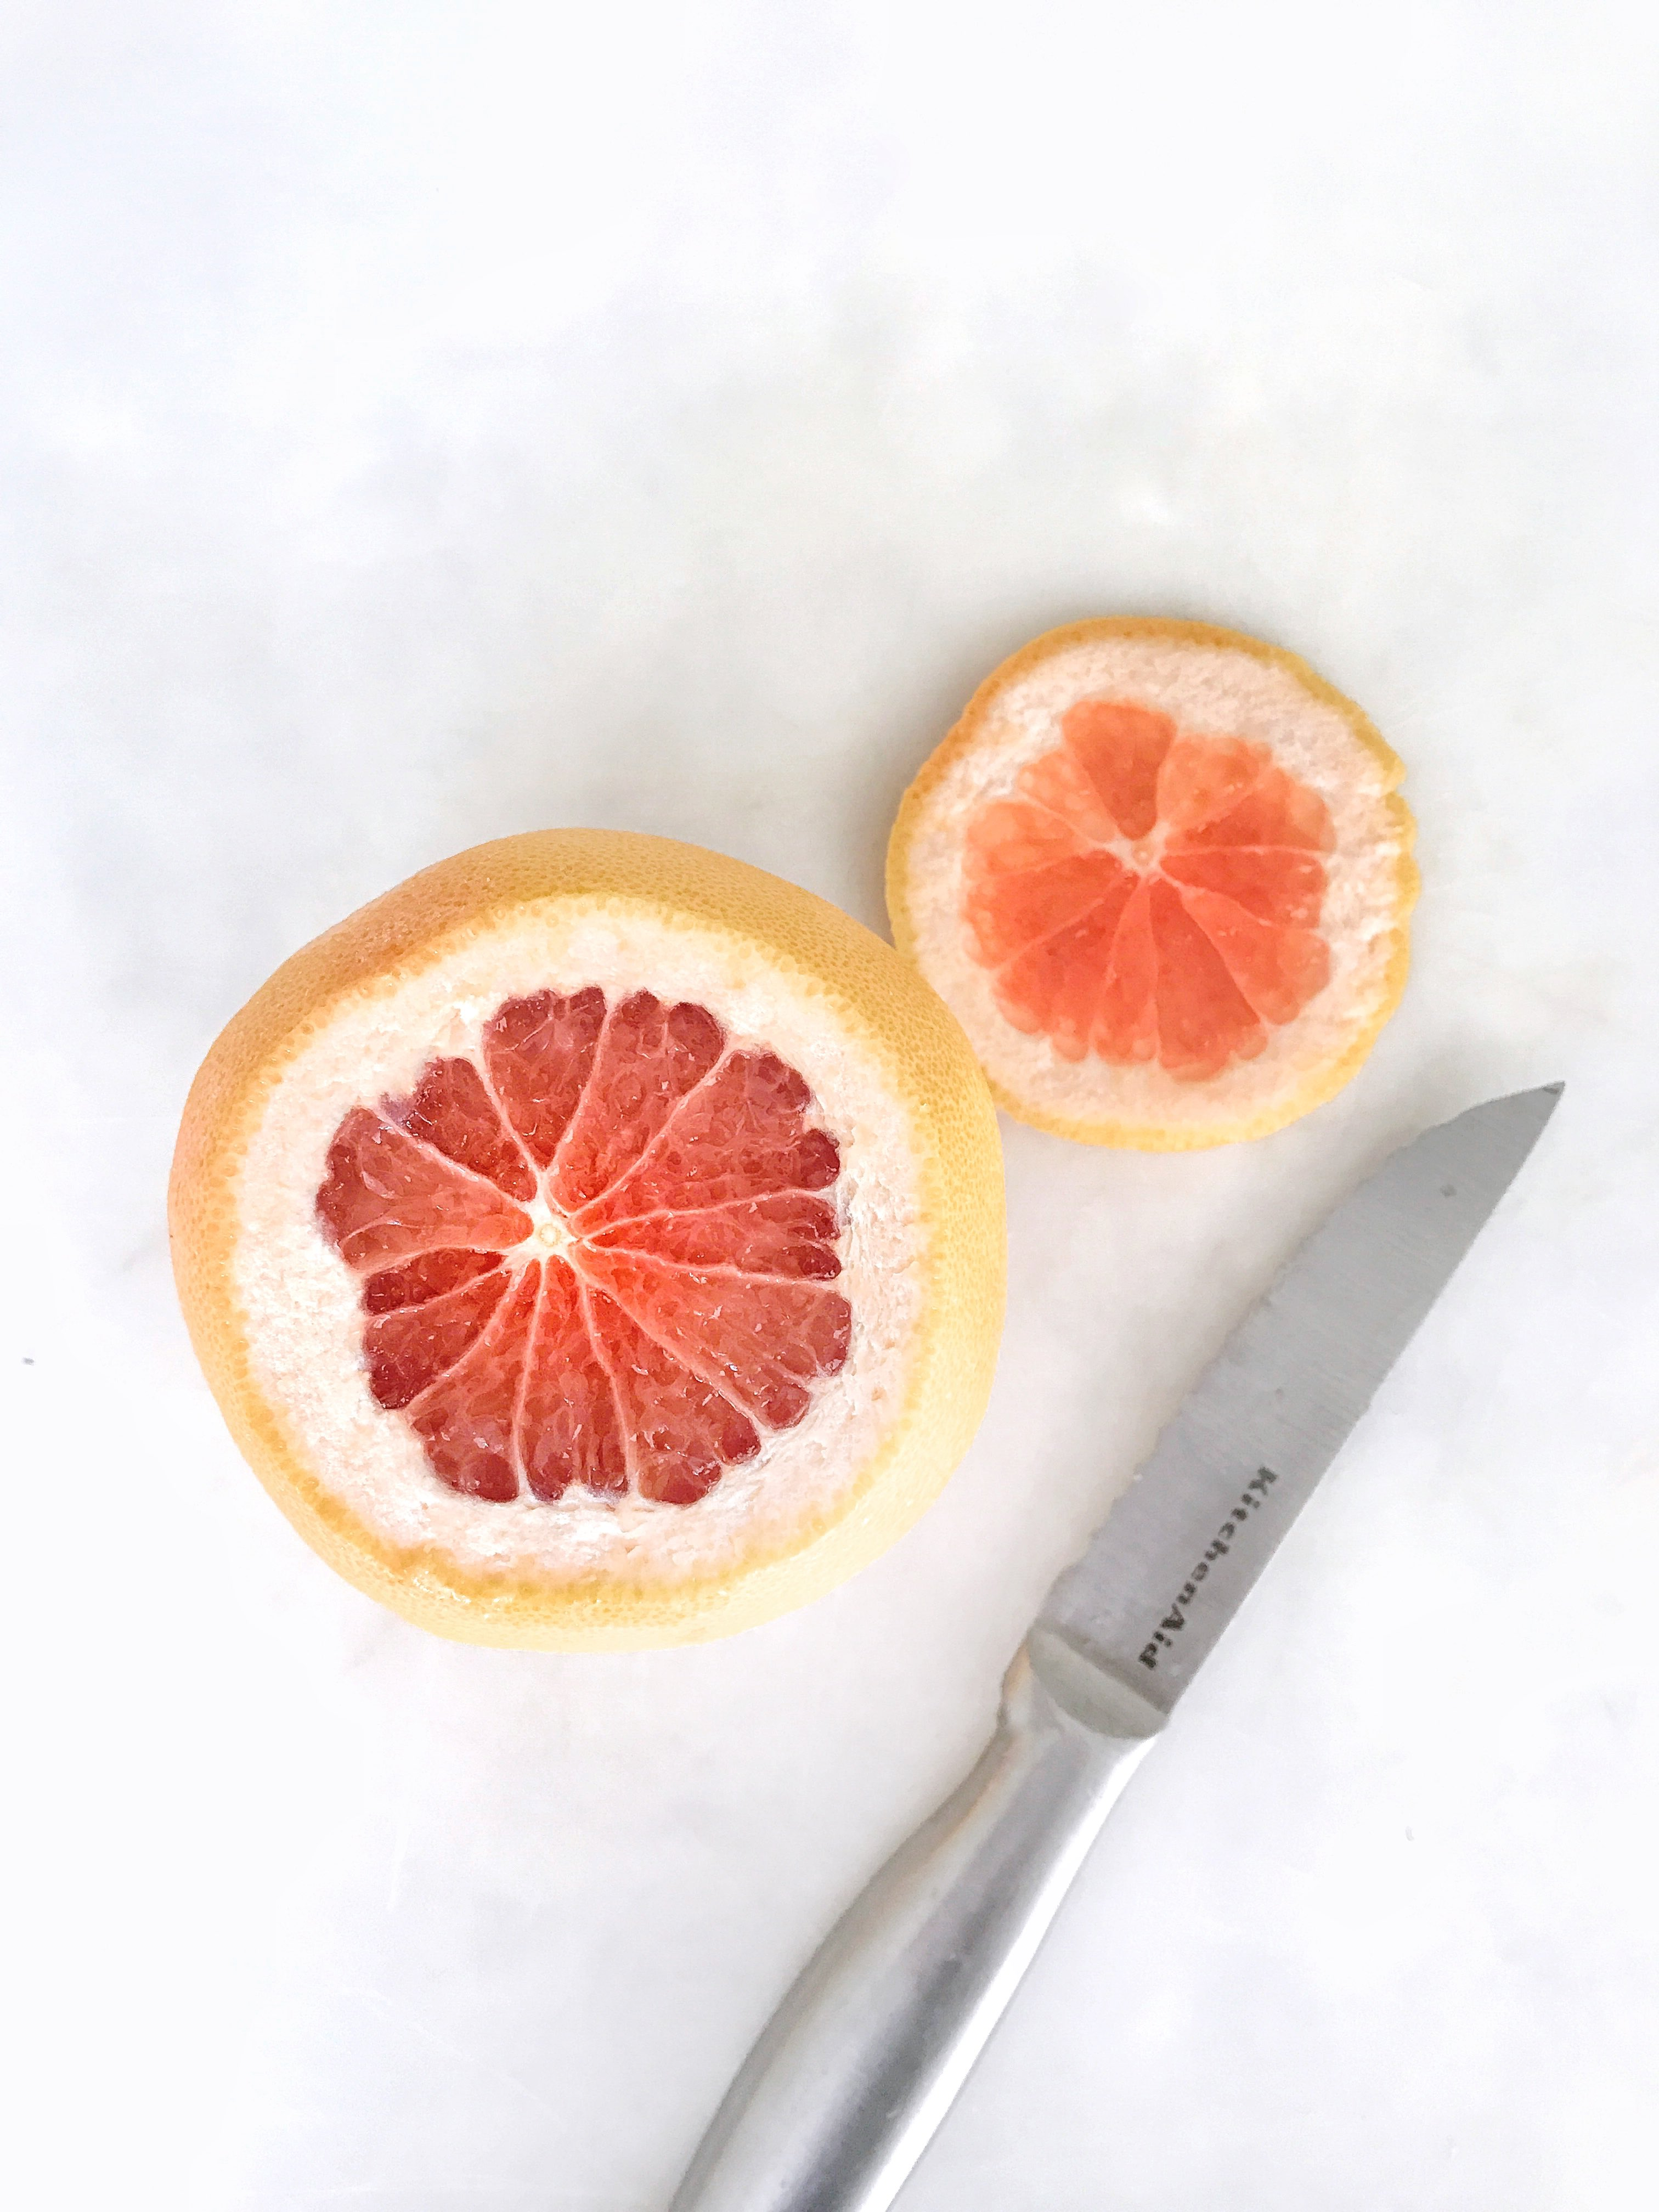 top of grapefruit sliced off